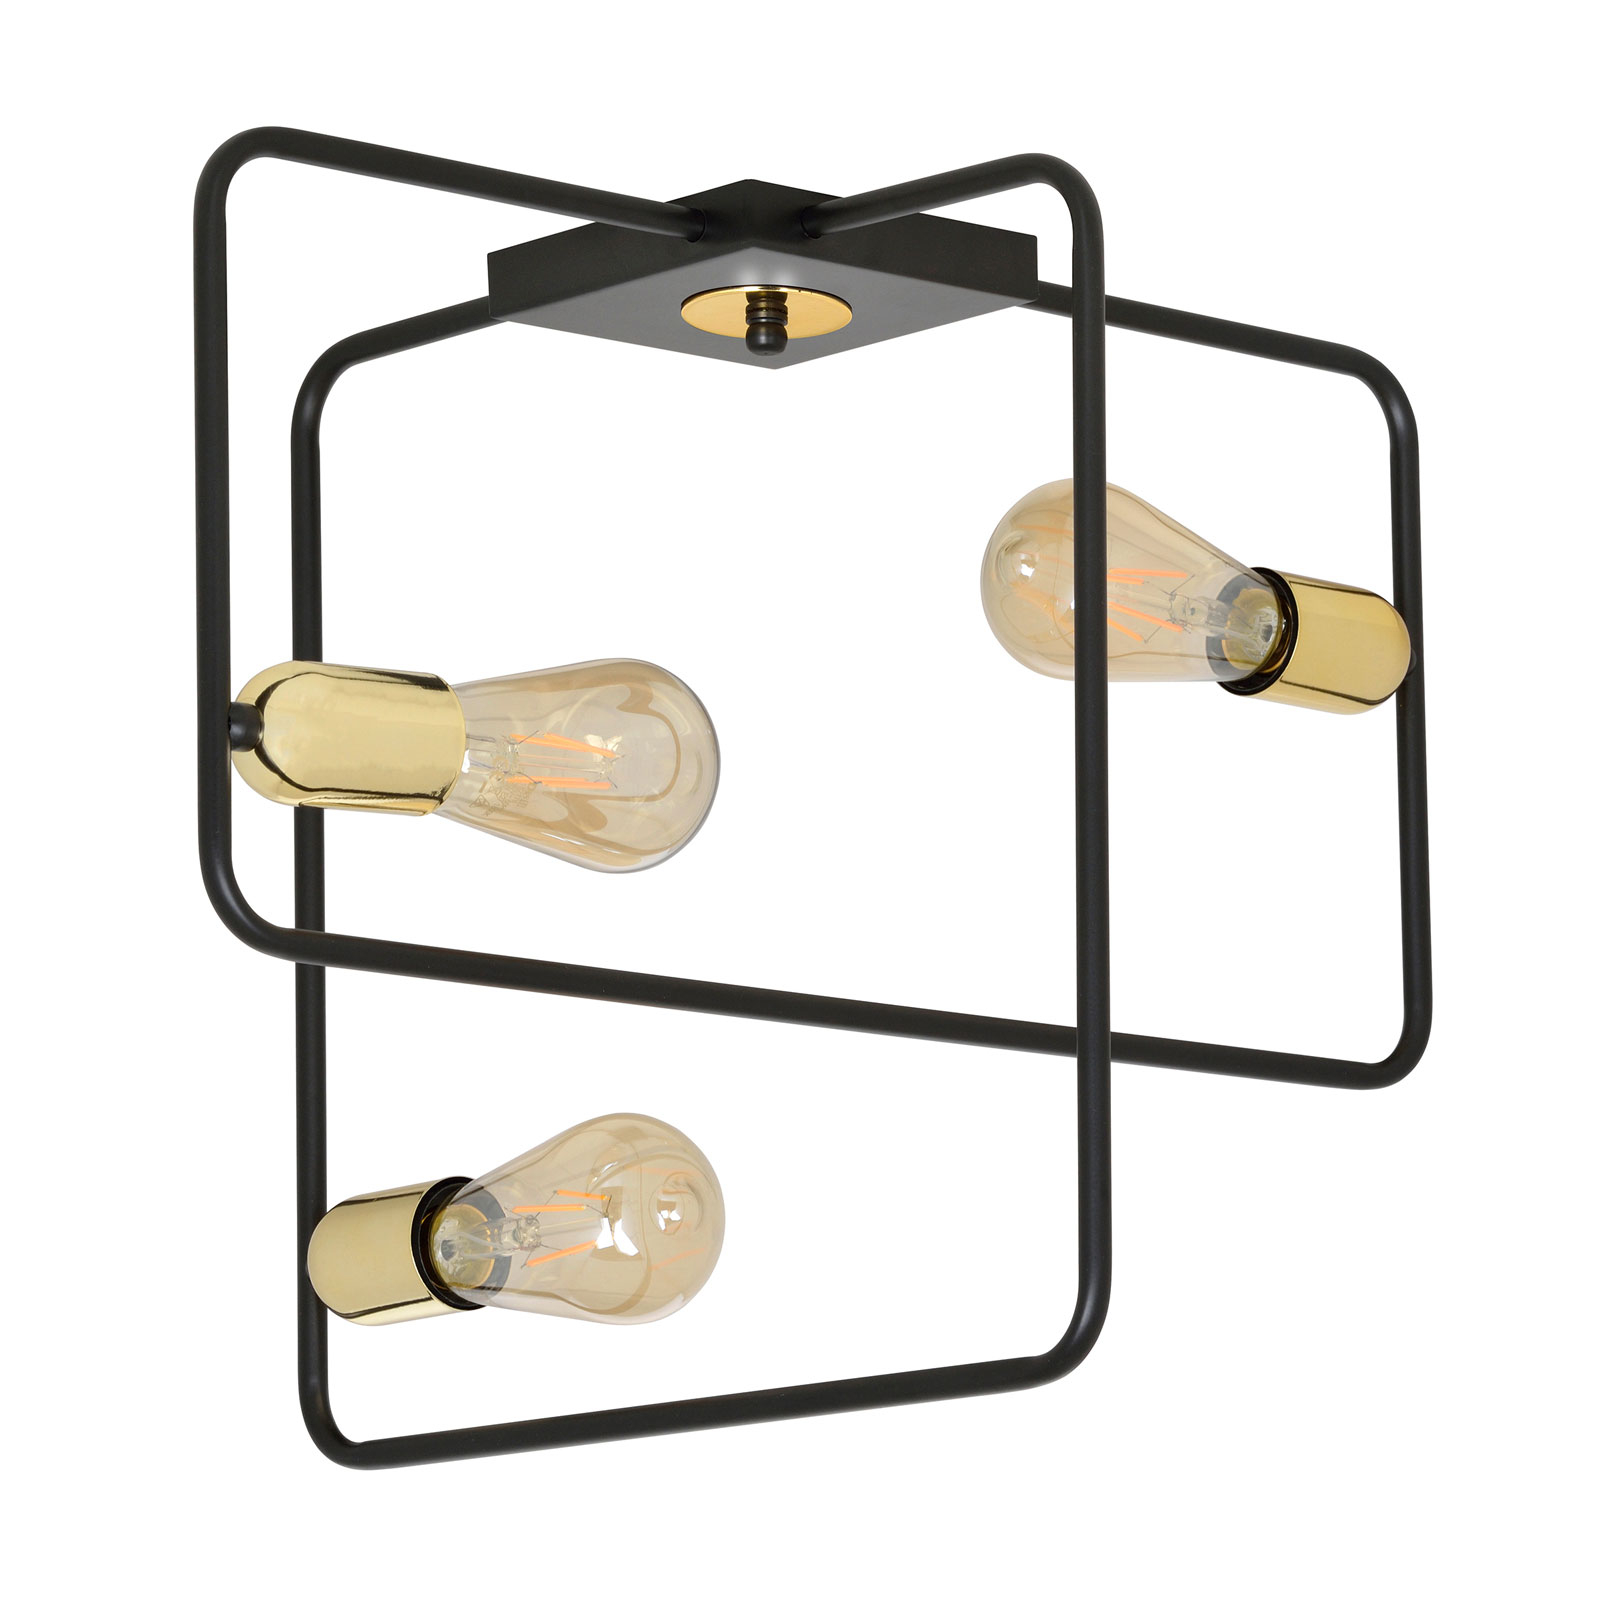 Taklampe Savo 3 med metallramme, svart-gull